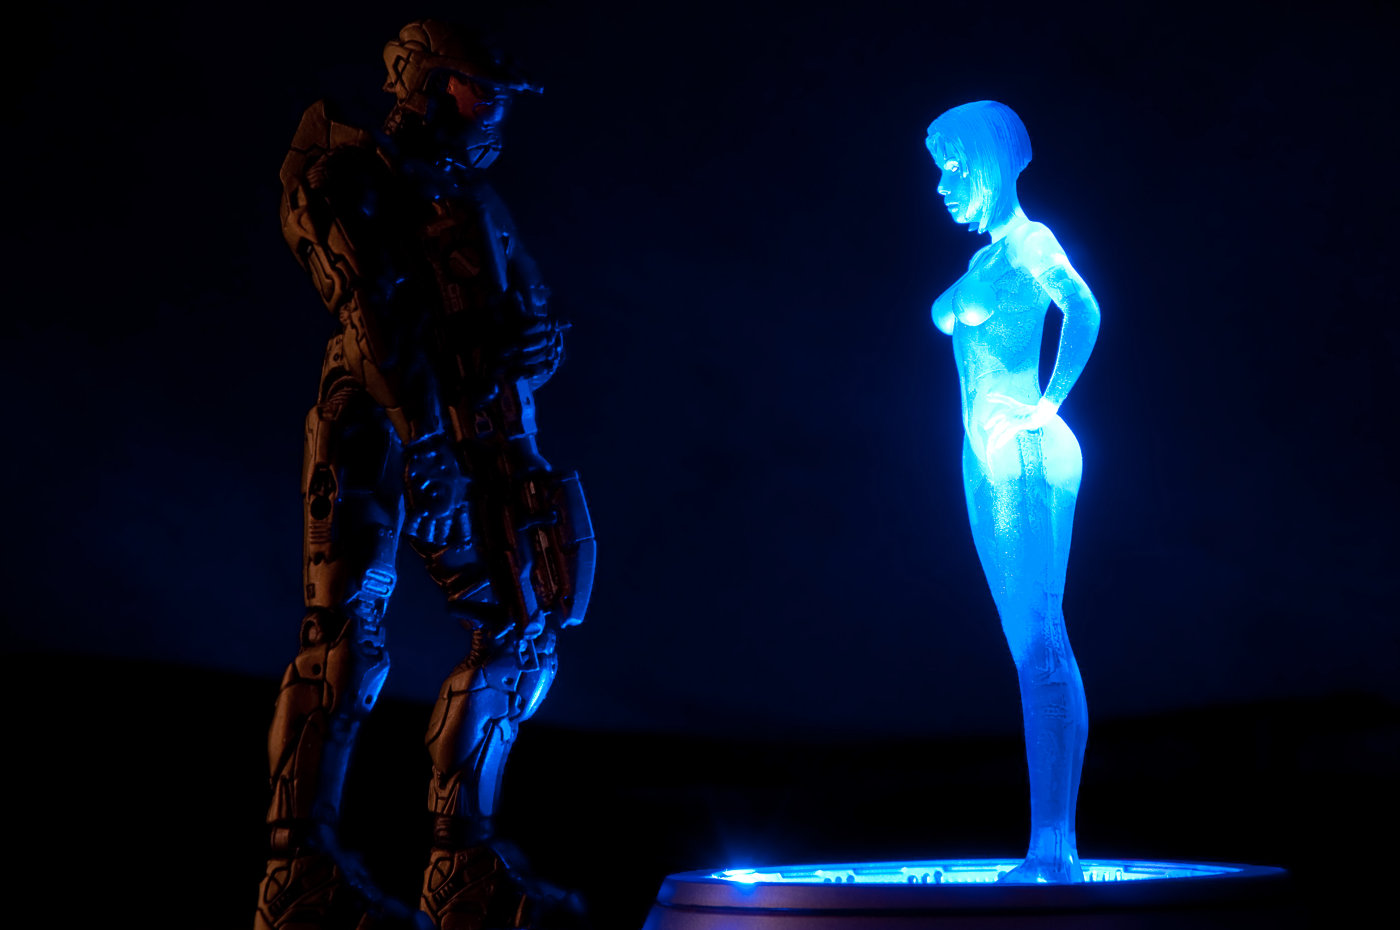 microsoft s ai no longer listens to hey cortana on android aivanet